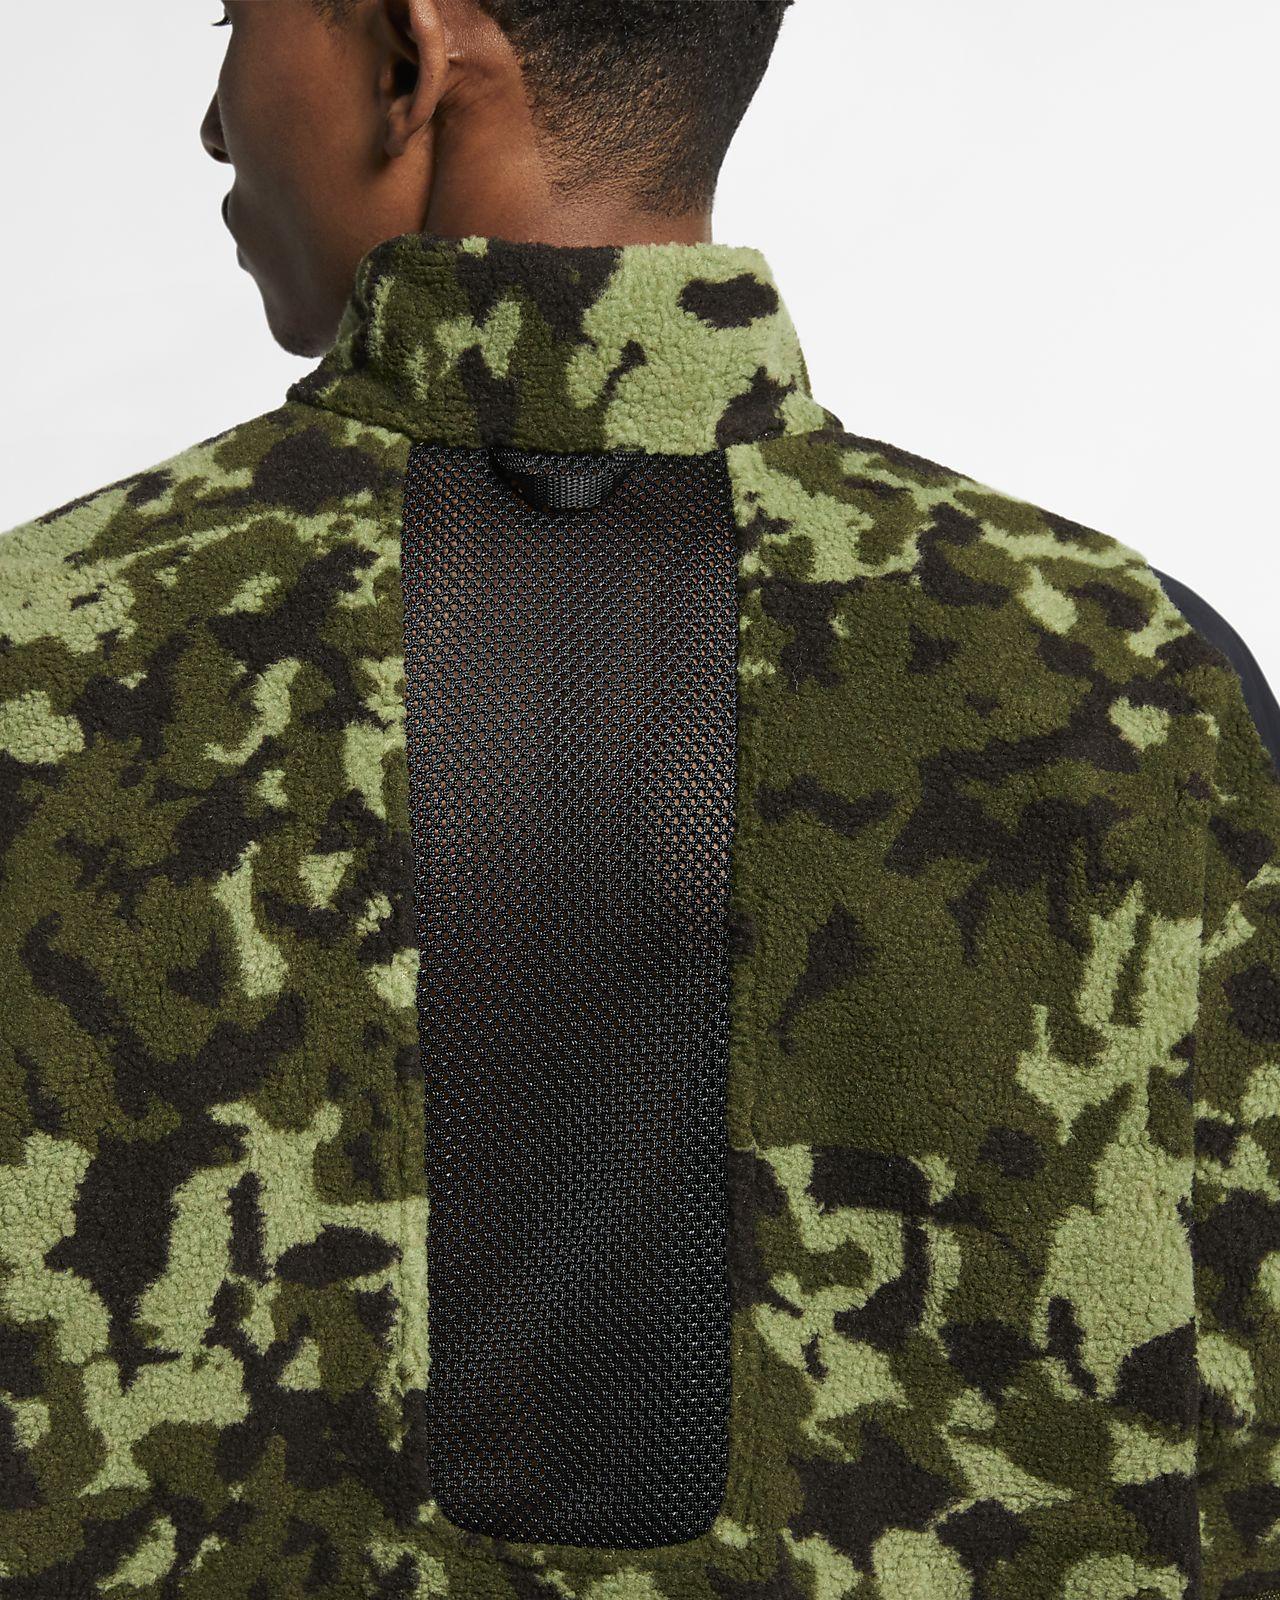 d1cbaaf27212 Nike x MMW Men s Hooded Fleece Jacket. Nike.com SG